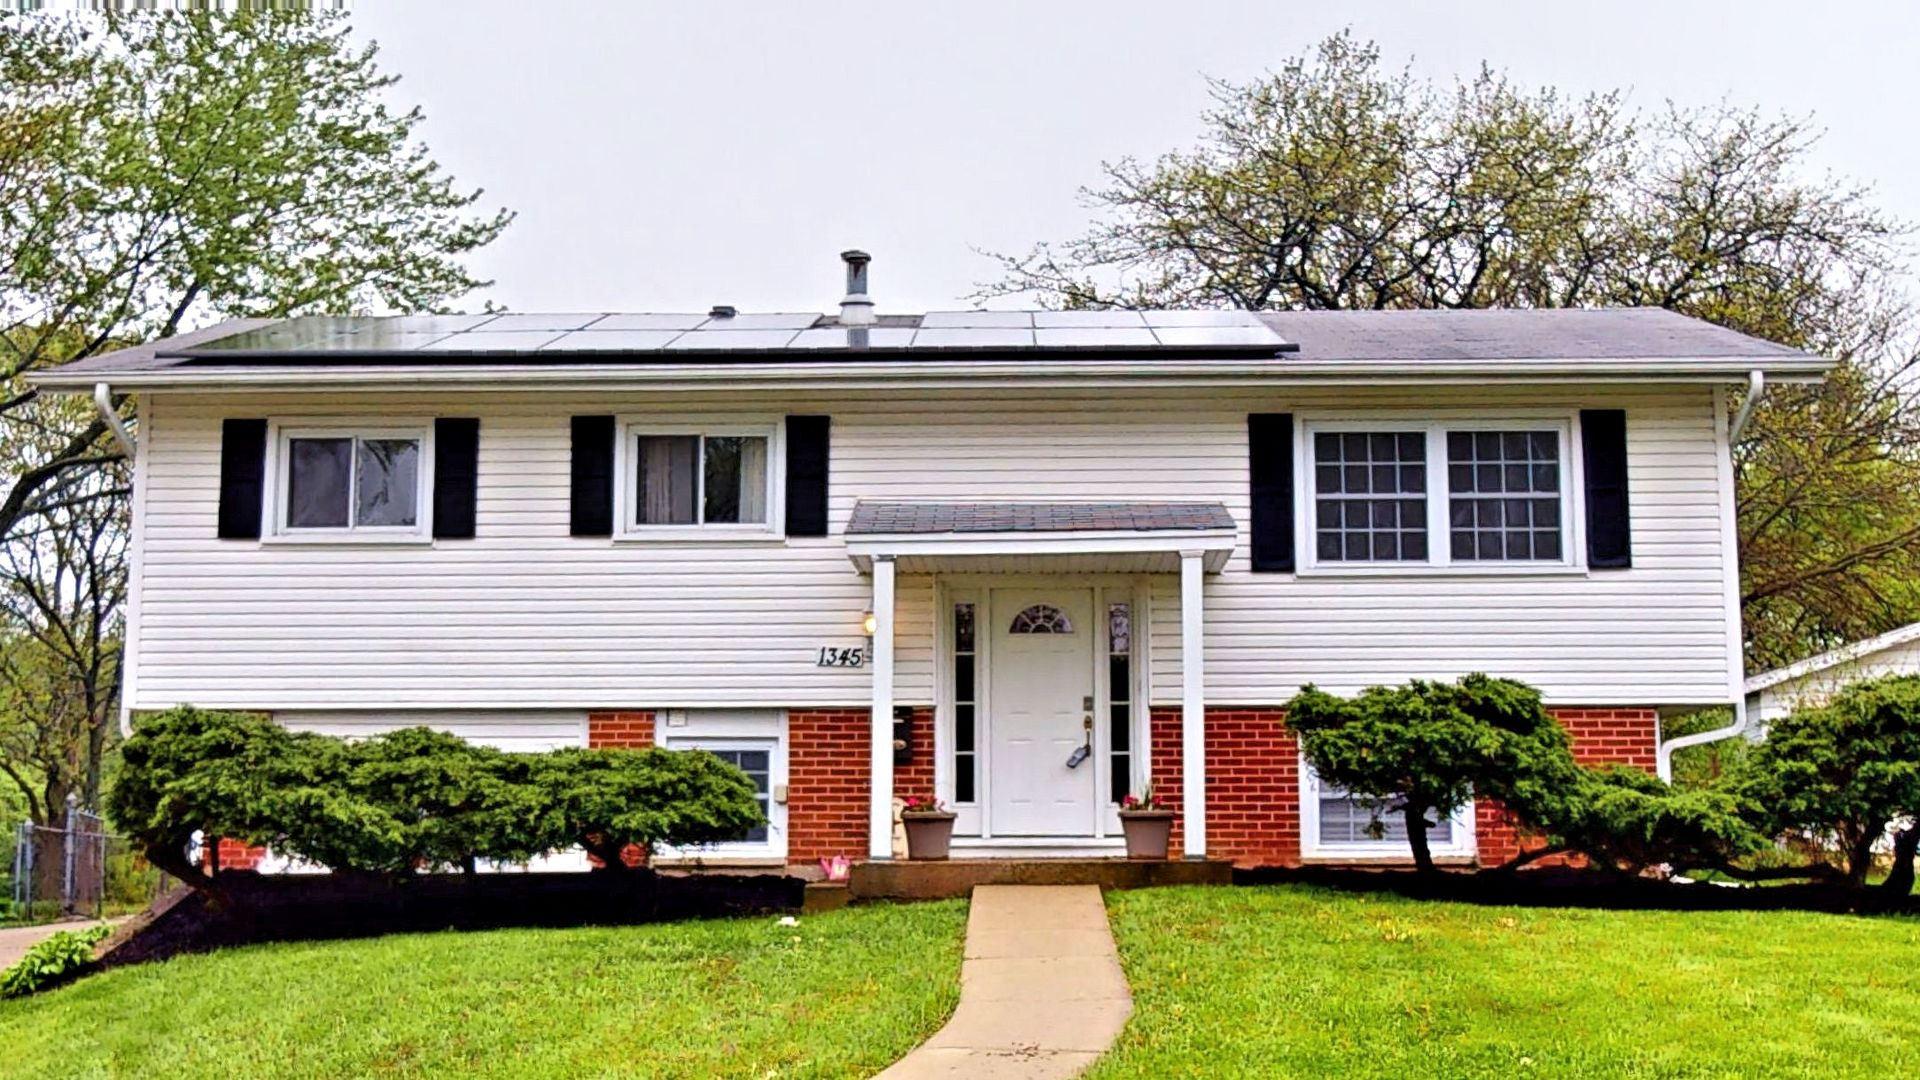 1345 Jefferson Road, Hoffman Estates, IL 60169 - #: 10720095